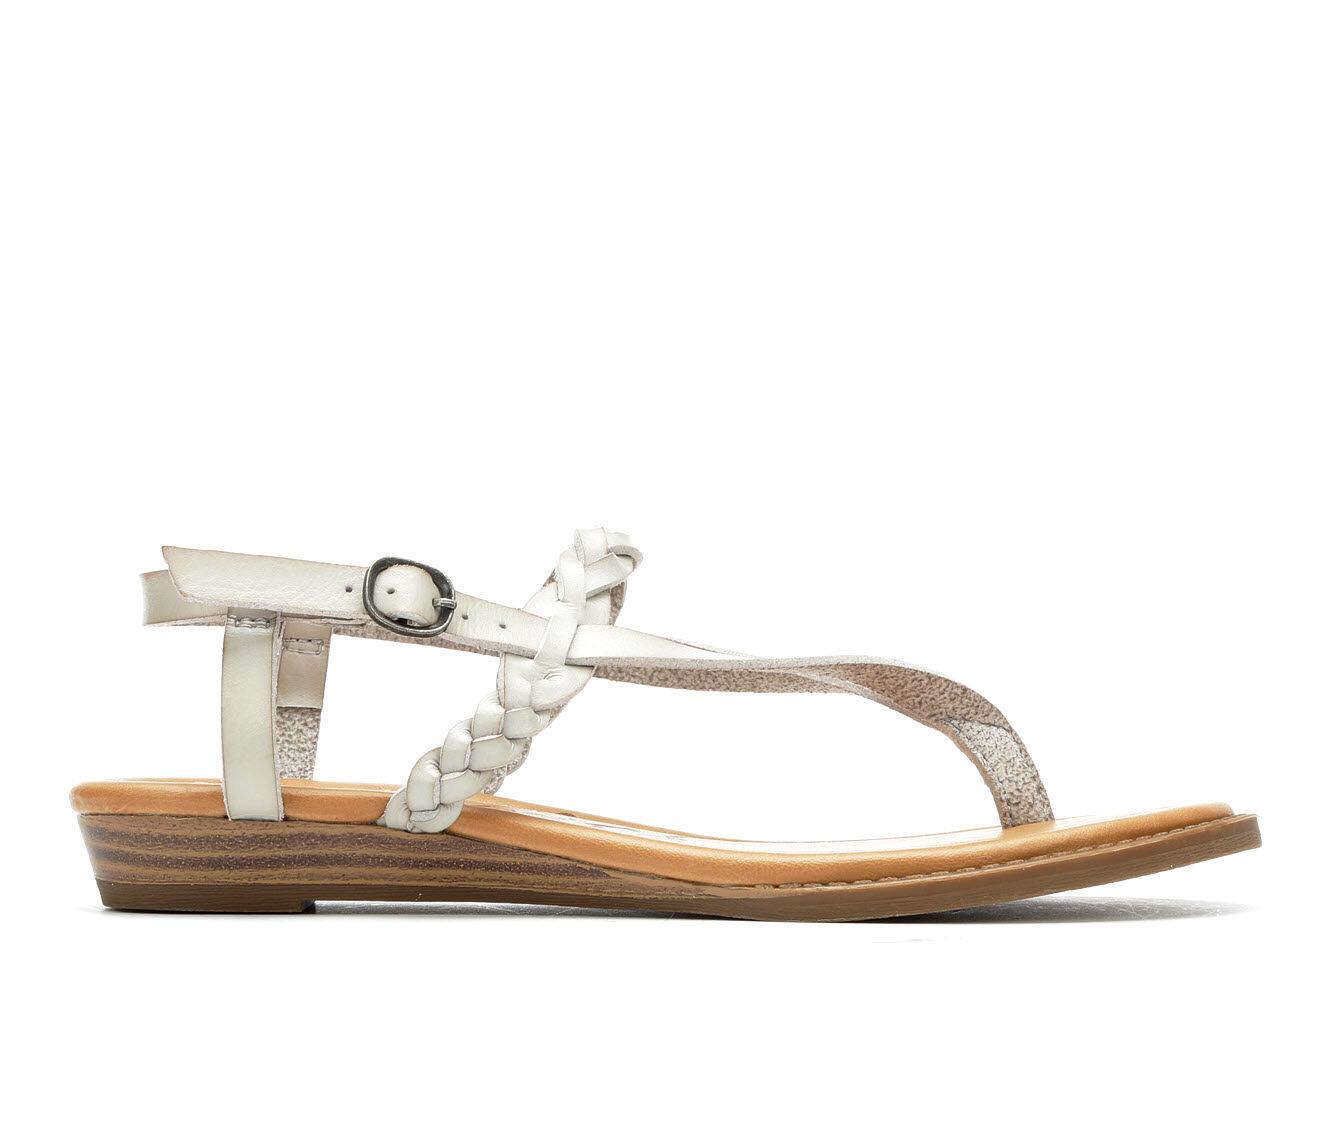 purchase new arrivals Women's Blowfish Malibu Berg-B Sandals Stone Grey